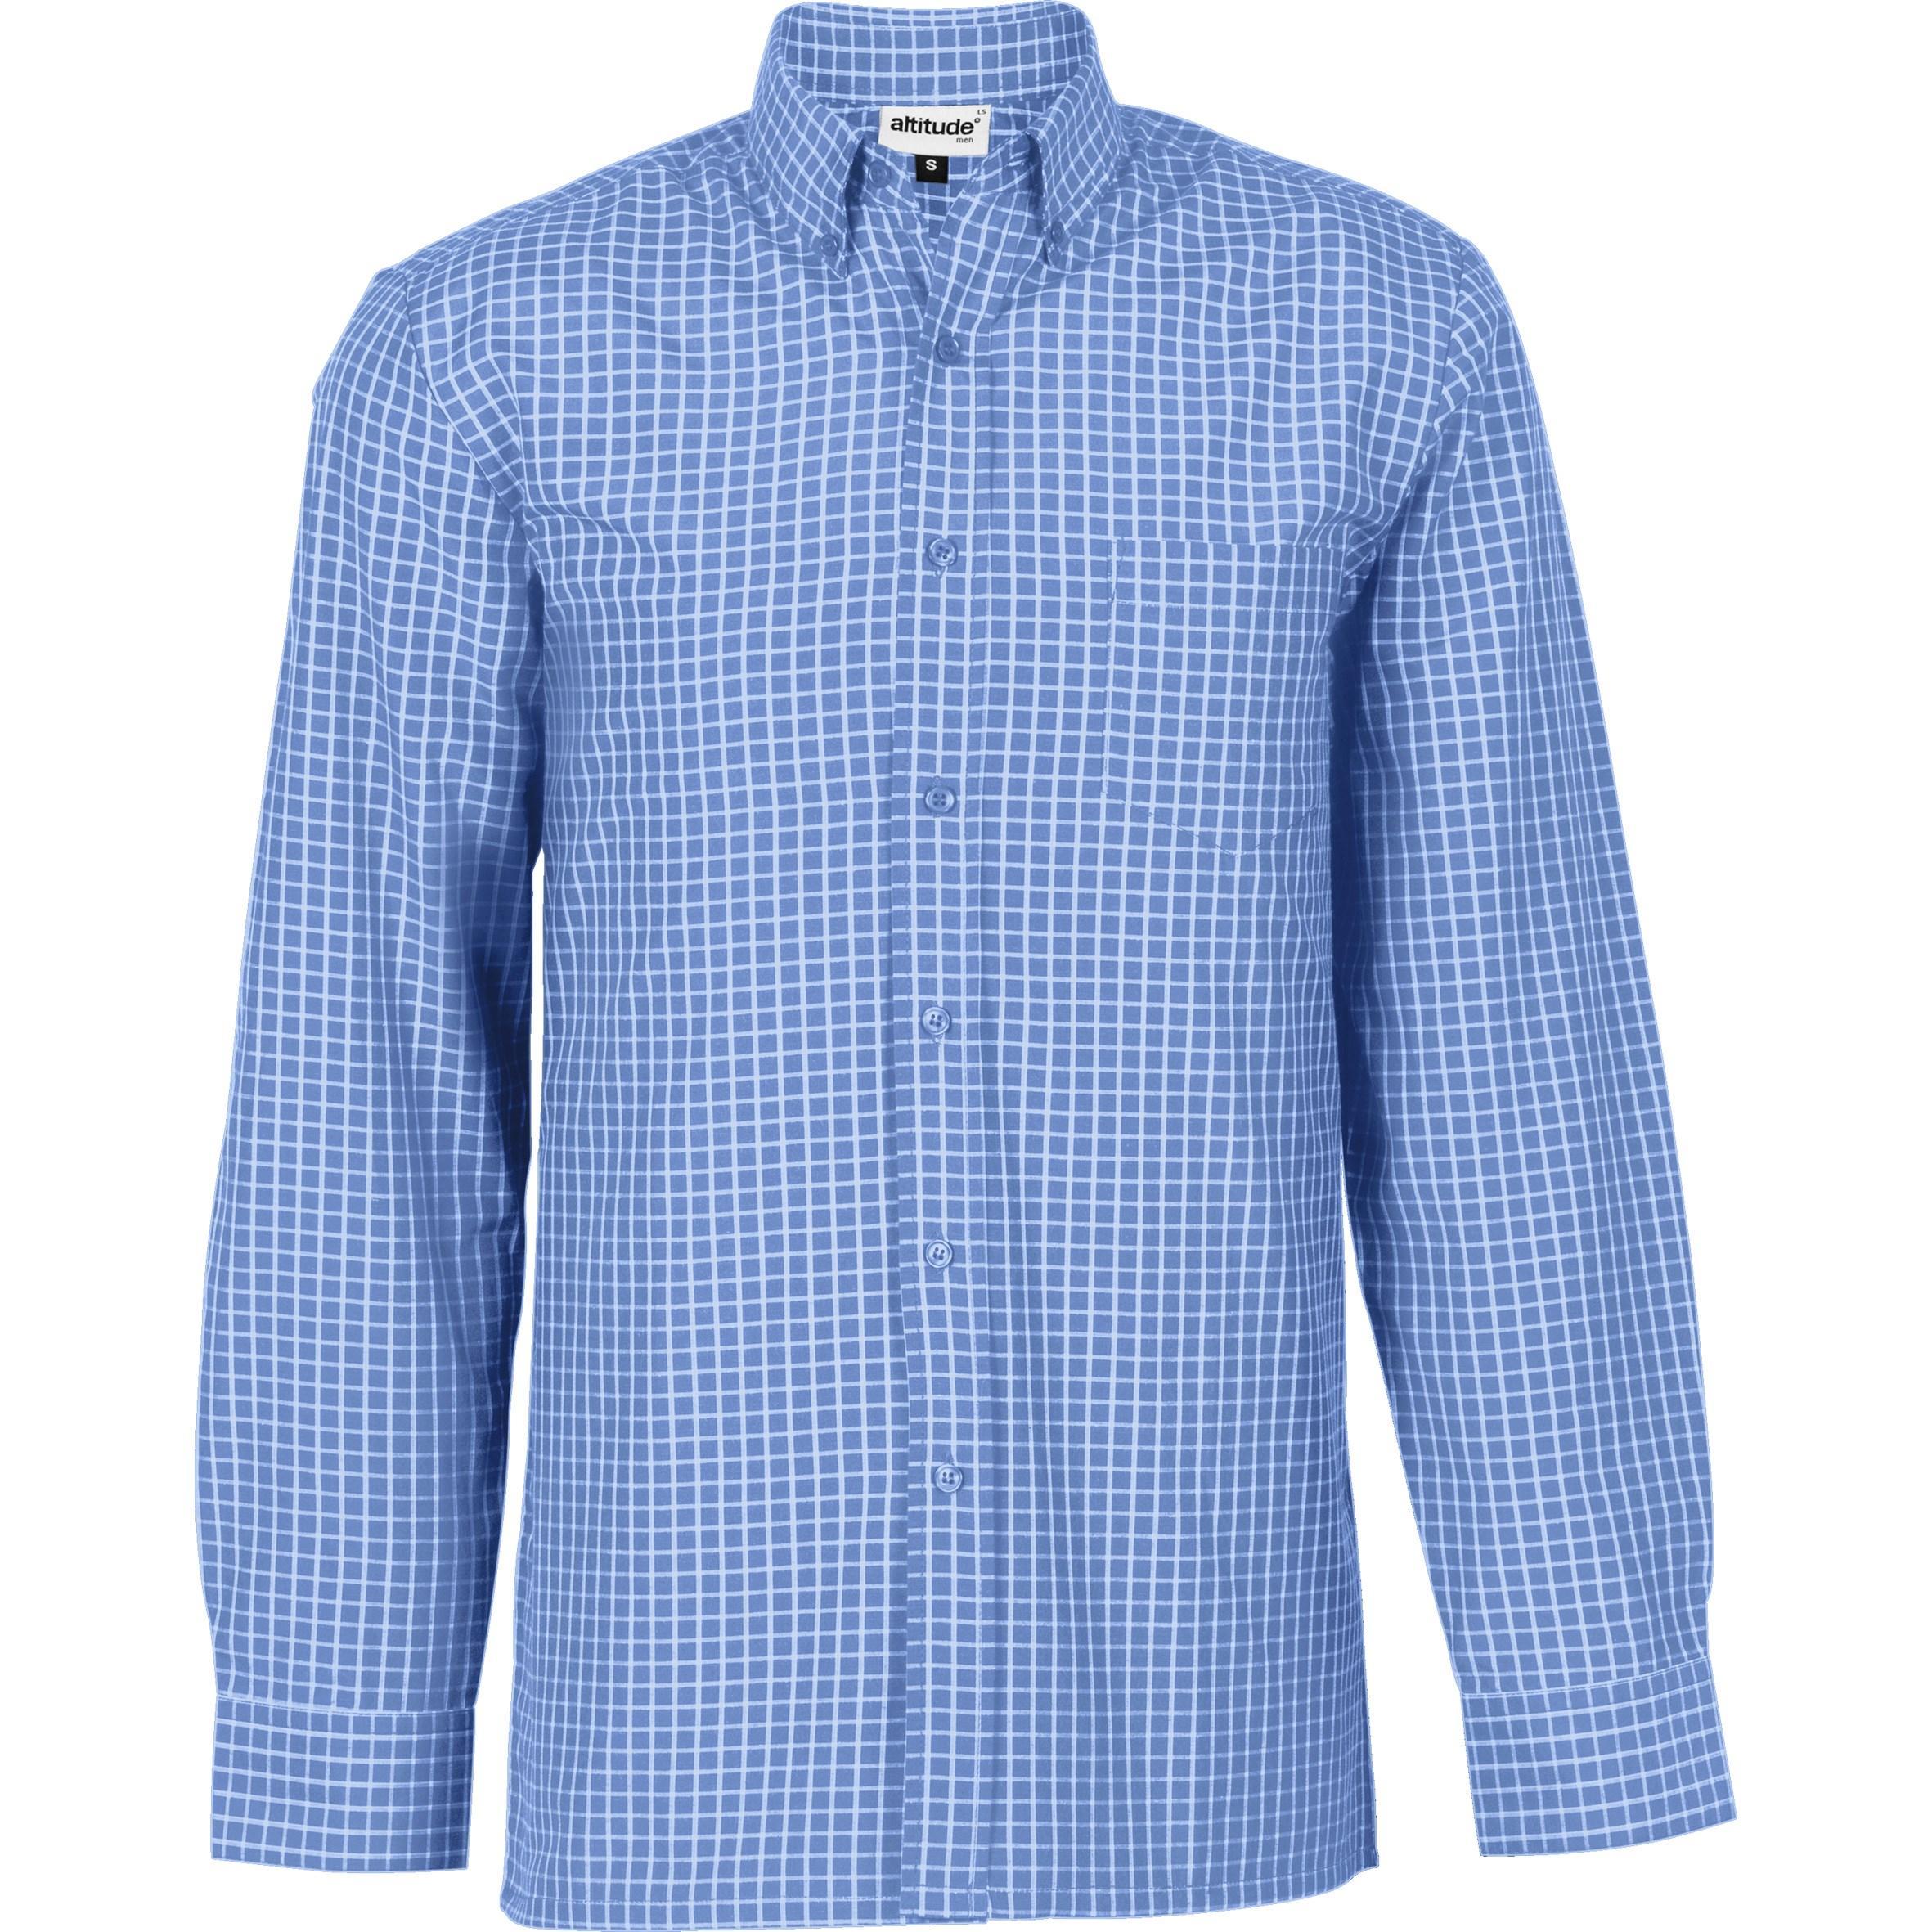 Mens Long Sleeve Prestige Shirt - Light Blue Only